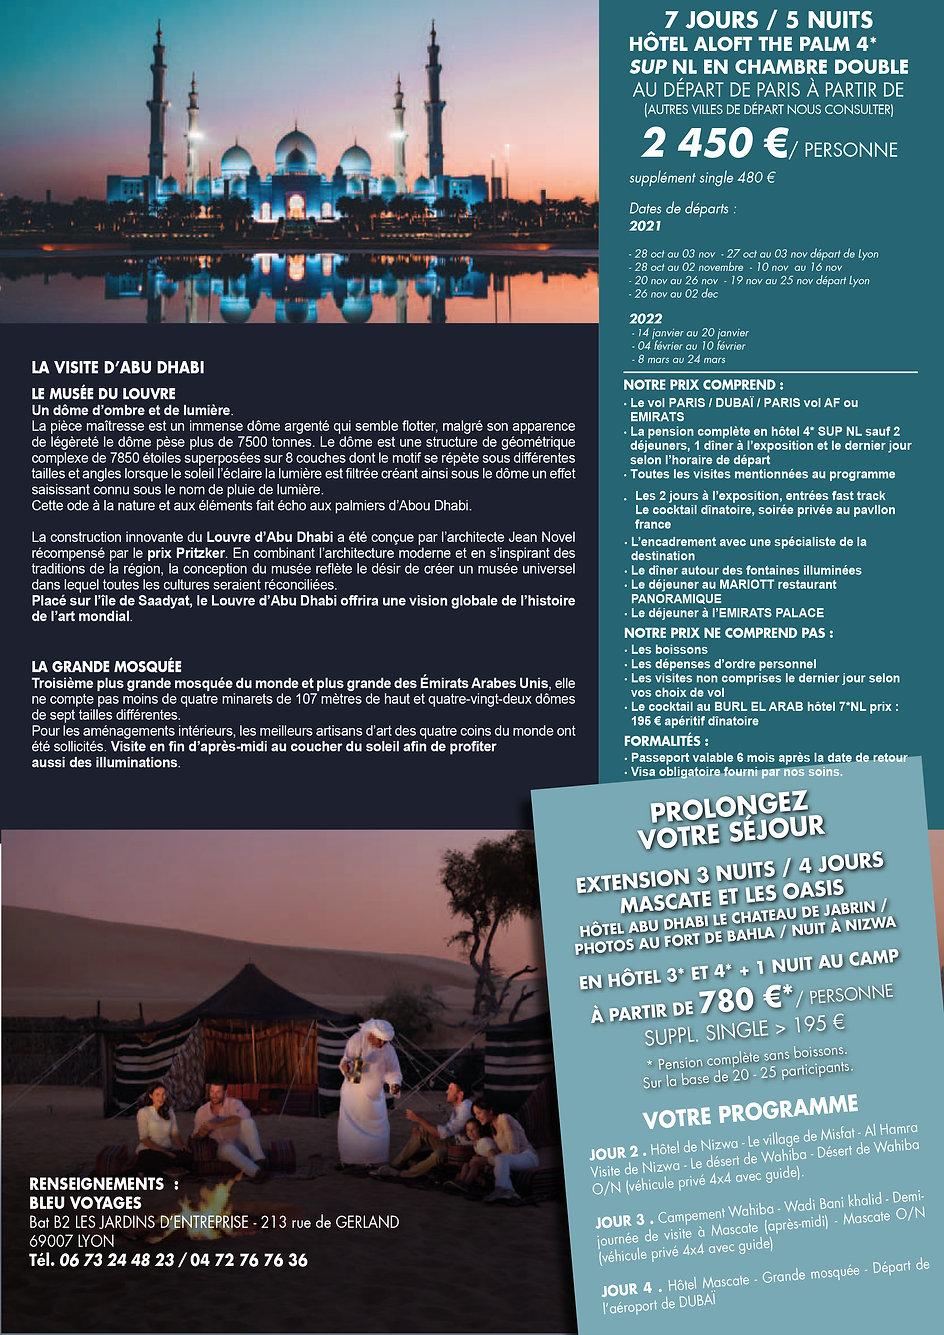 page-2-Dubai-7-jours-5-nuits-premium.jpg